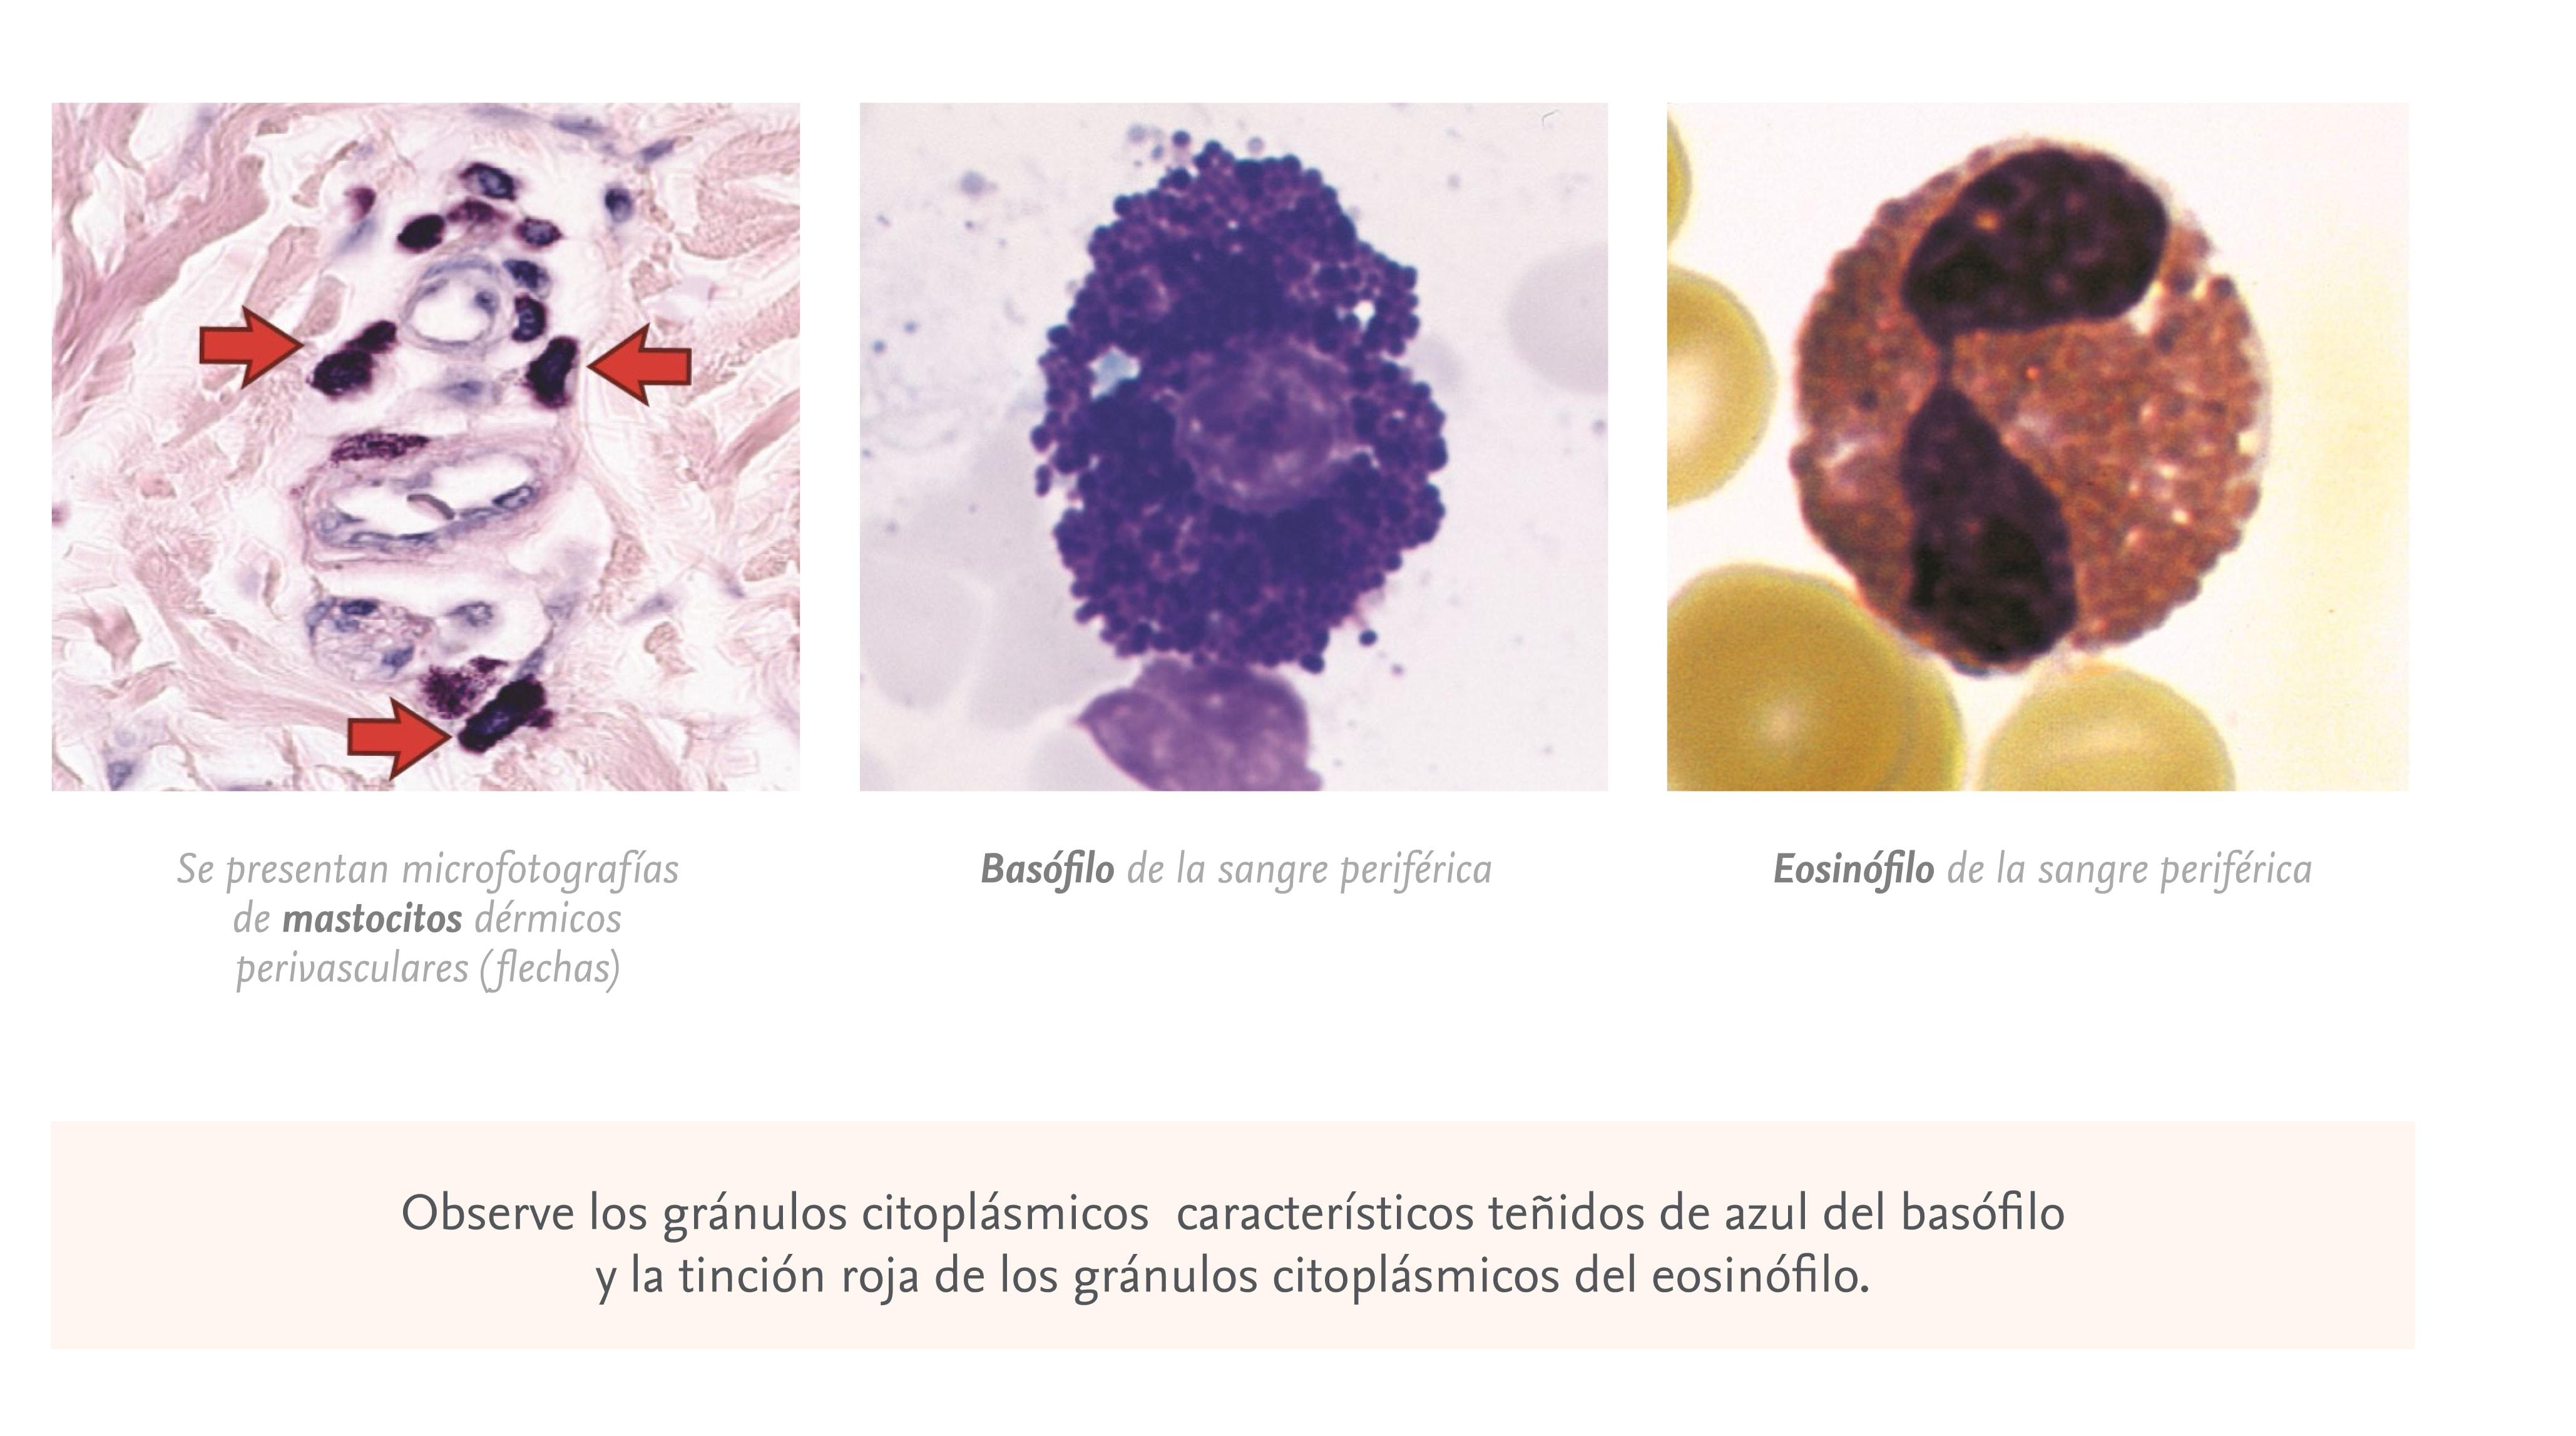 Celulas-alergia.jpg